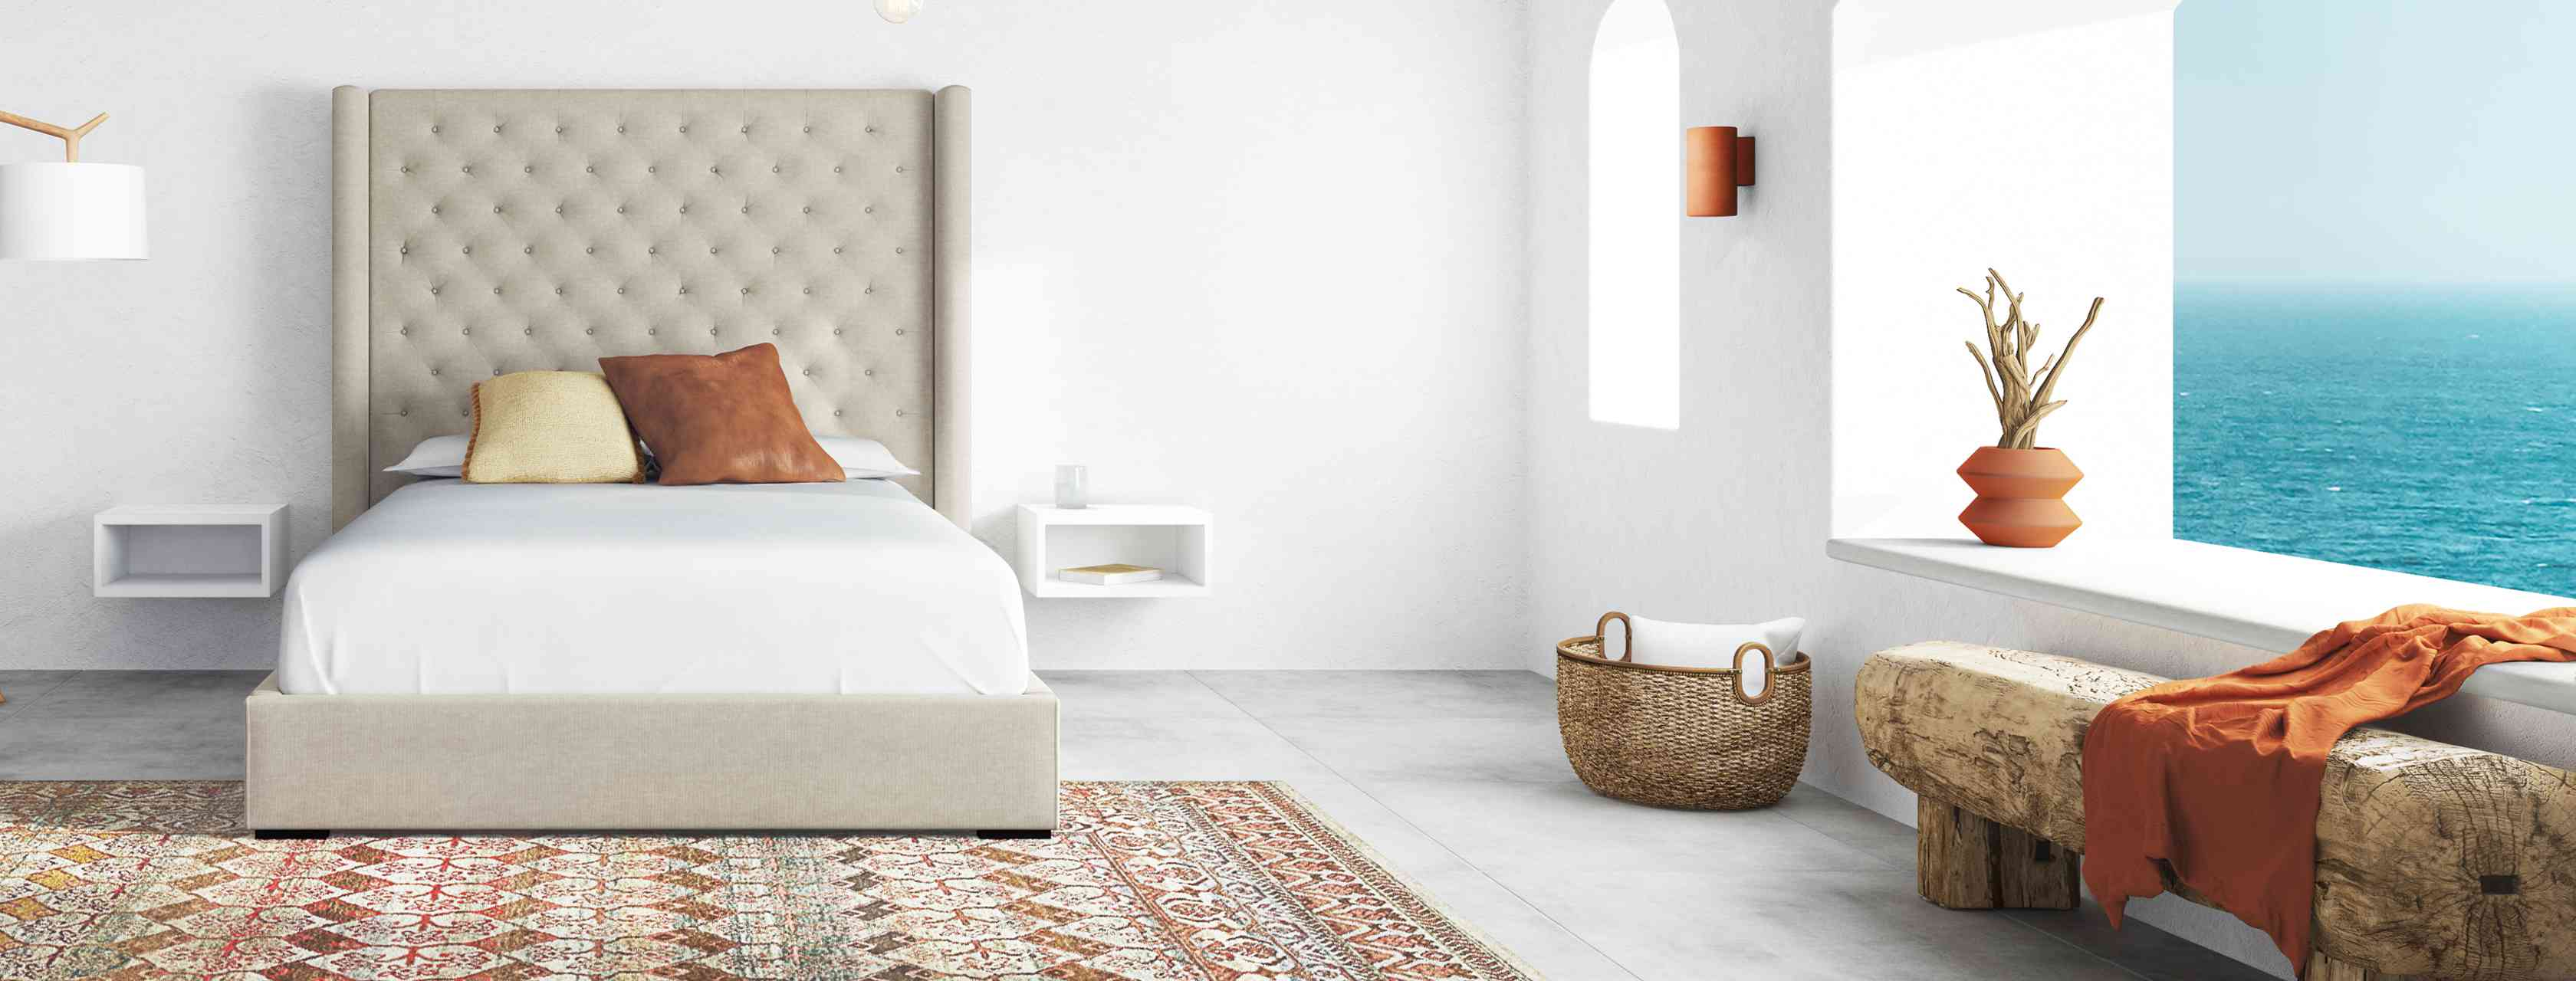 Saatva Amalfi Bed Frame